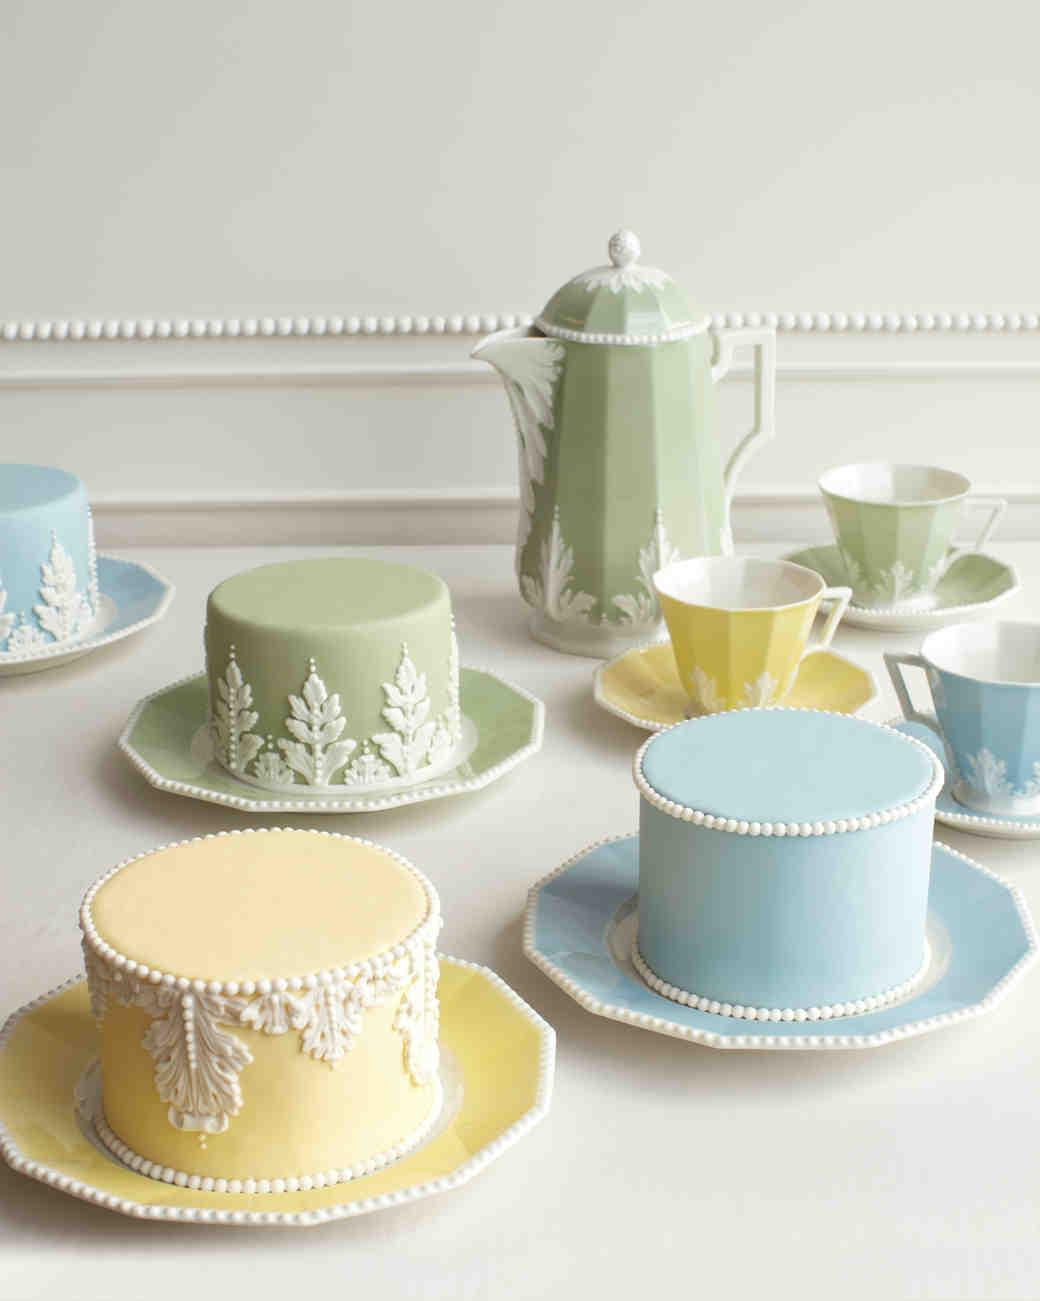 ron-ben-israel-cakes-winter-2012-mini-cakes-0814.jpg